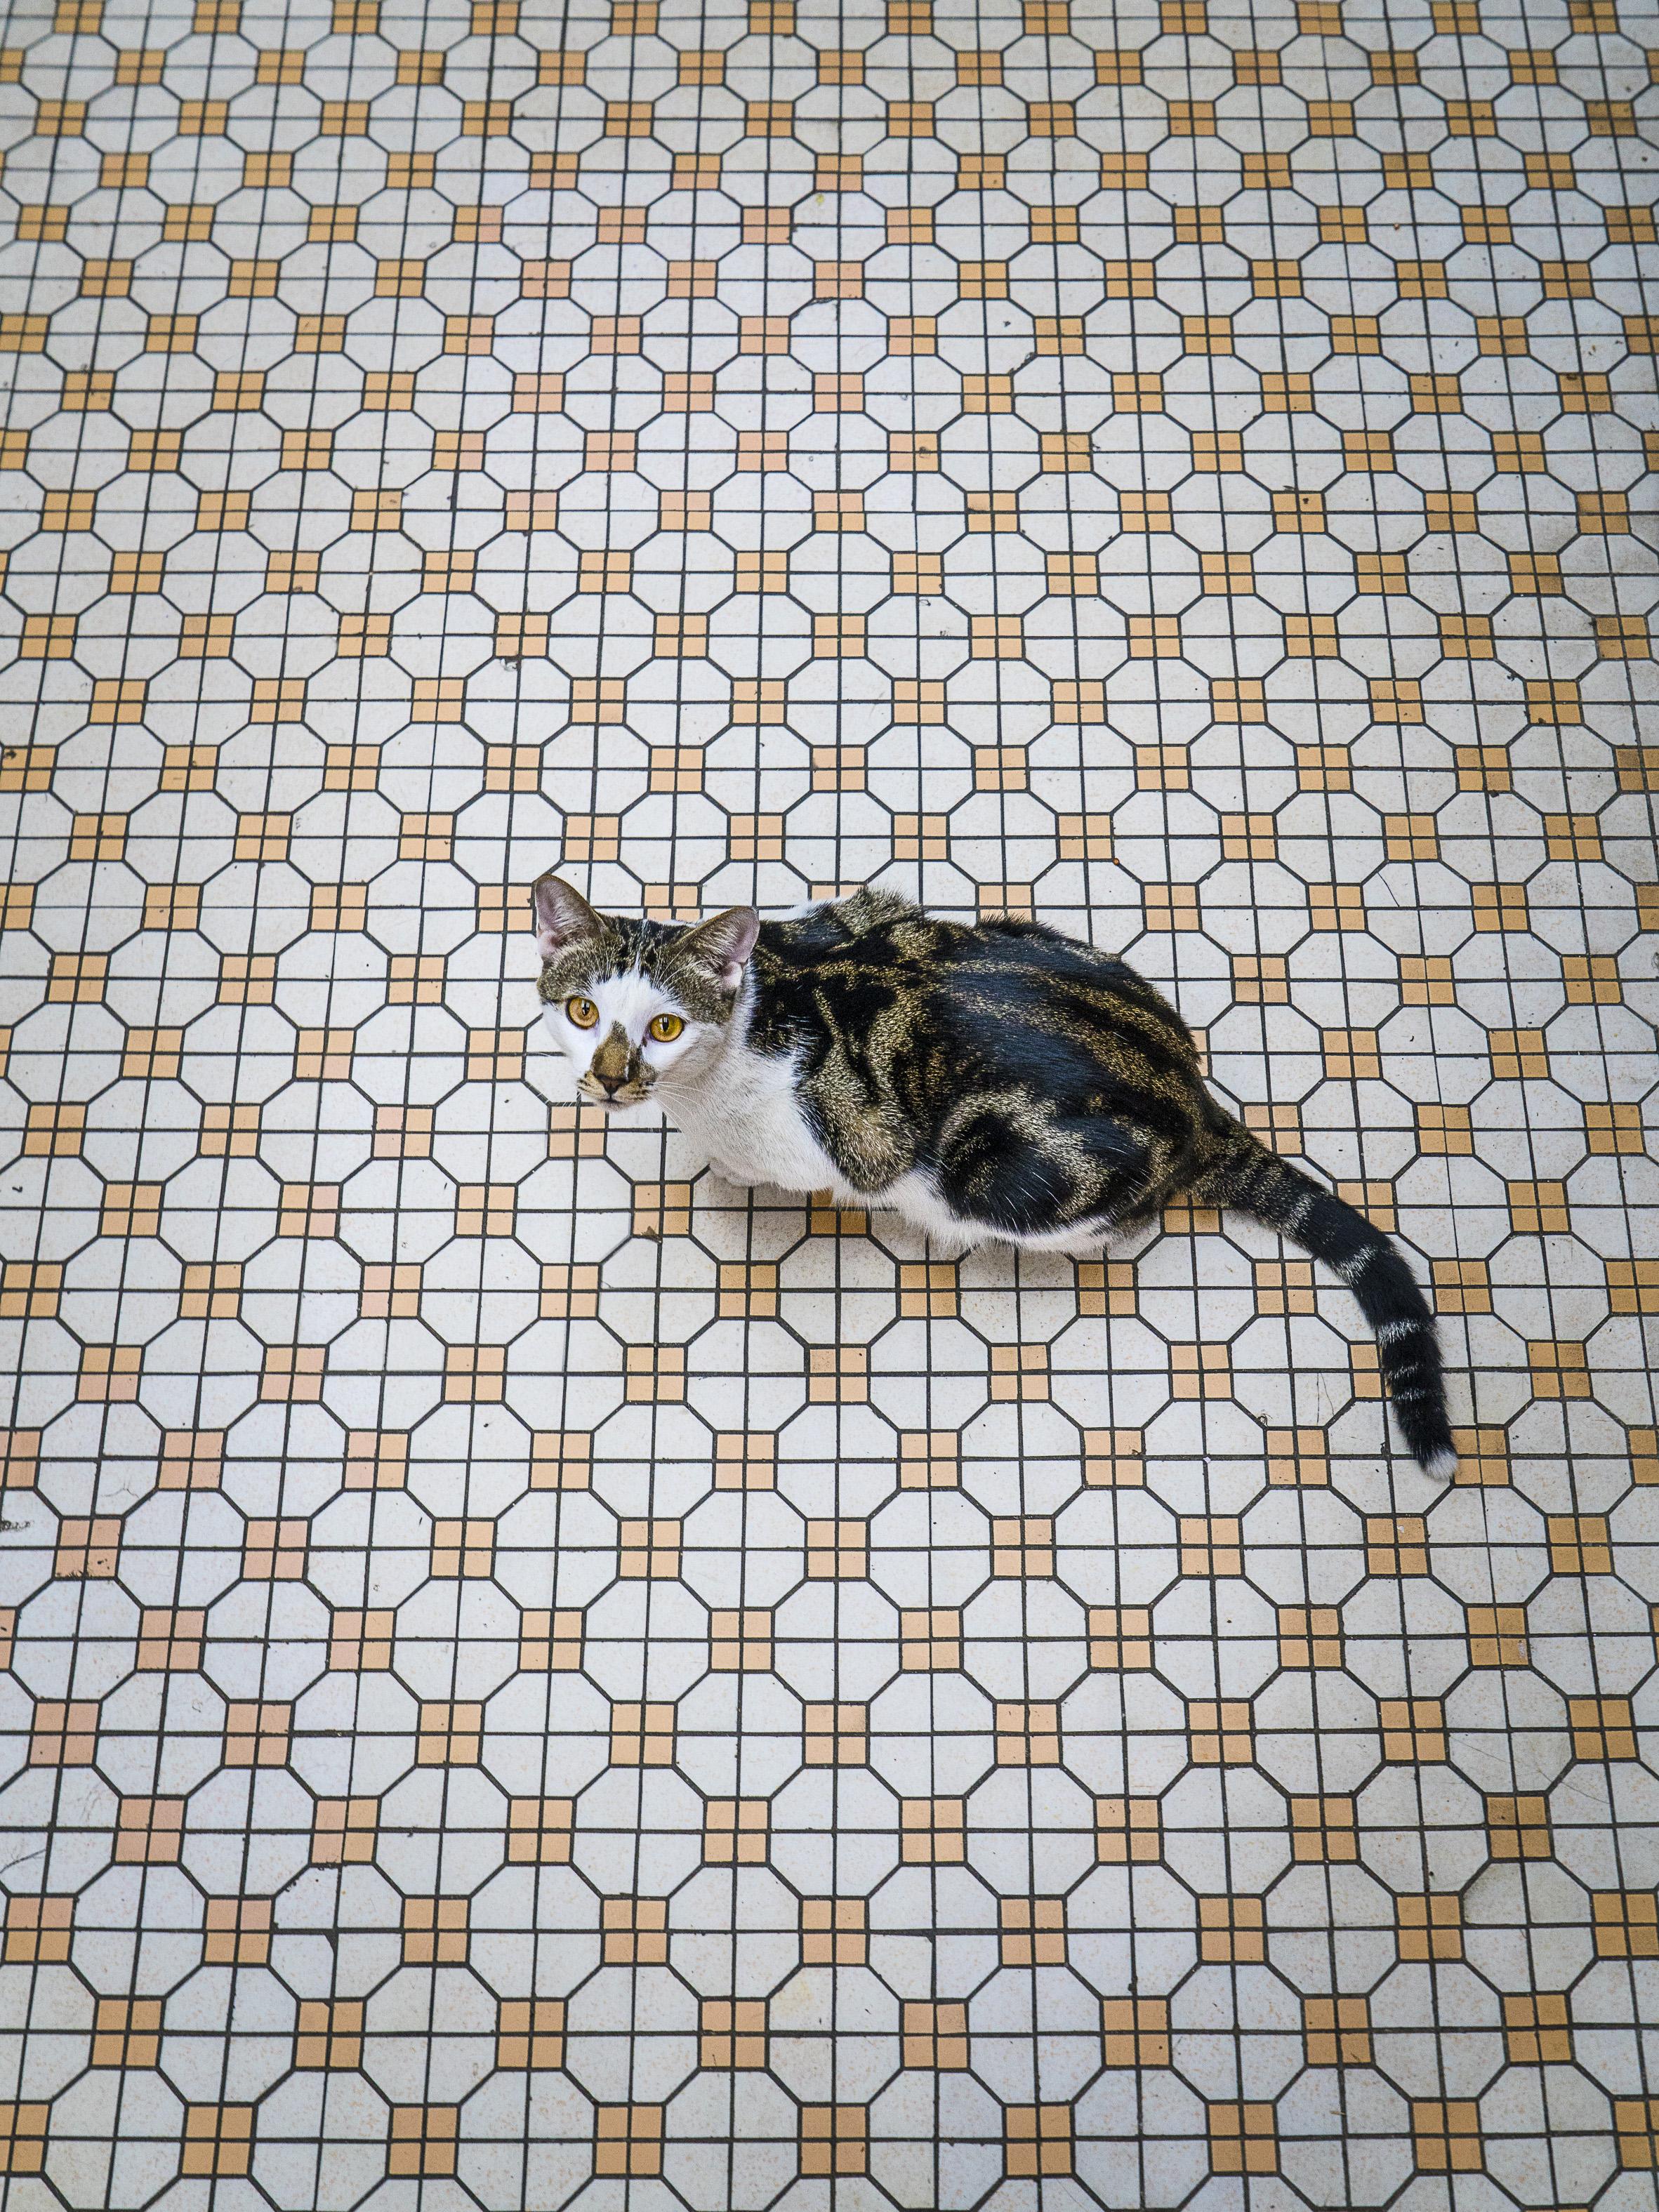 M. Heijnen, HK Shop Cats, 'Camouflage'.jpg